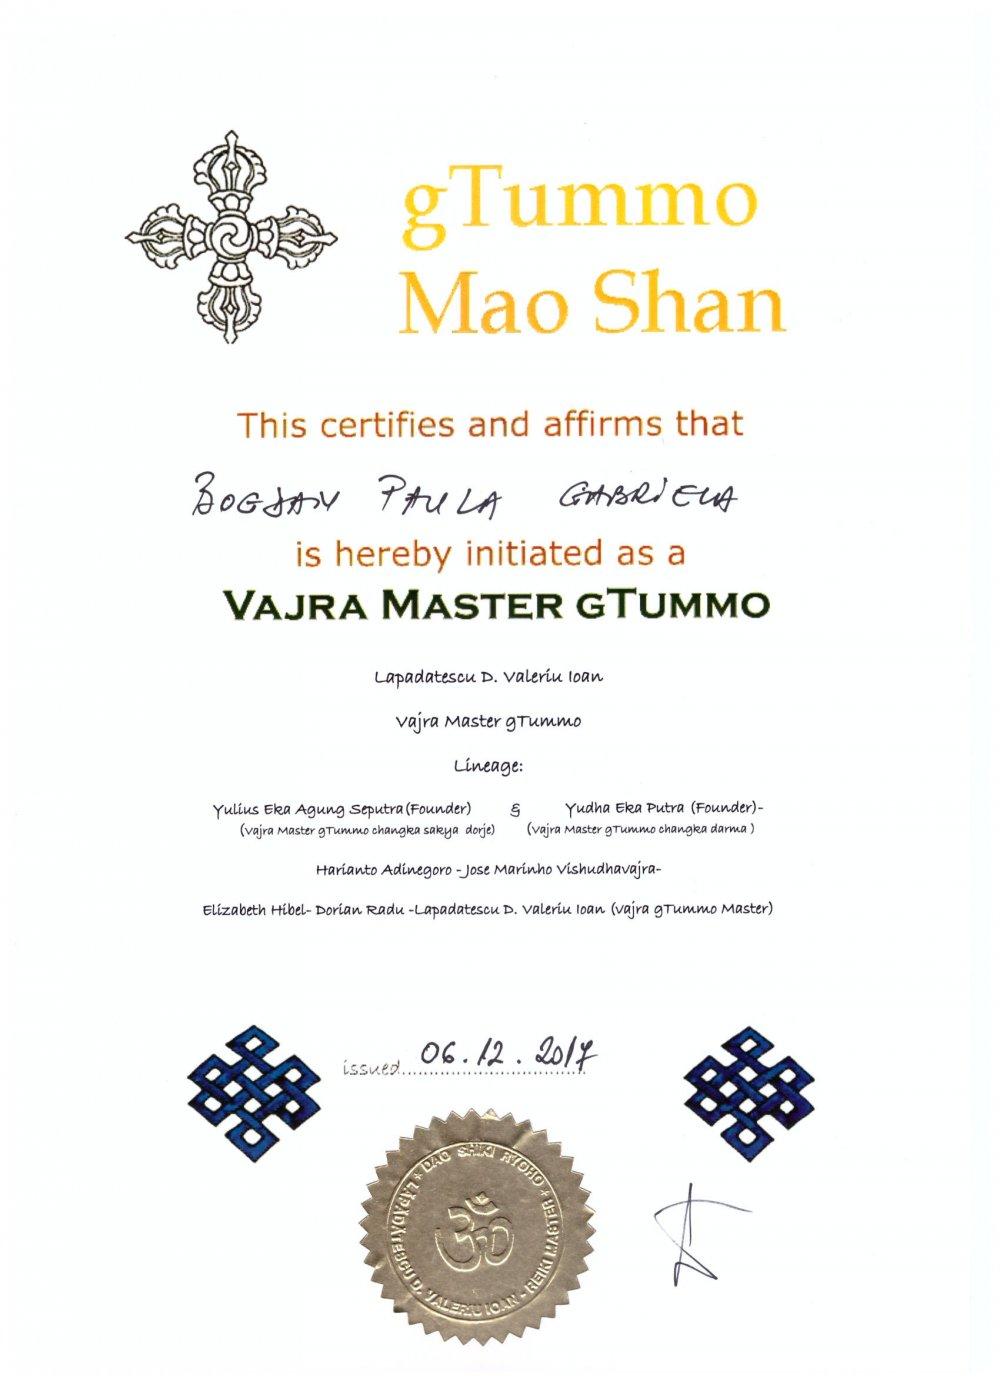 Diploma gTummo Mao Shan